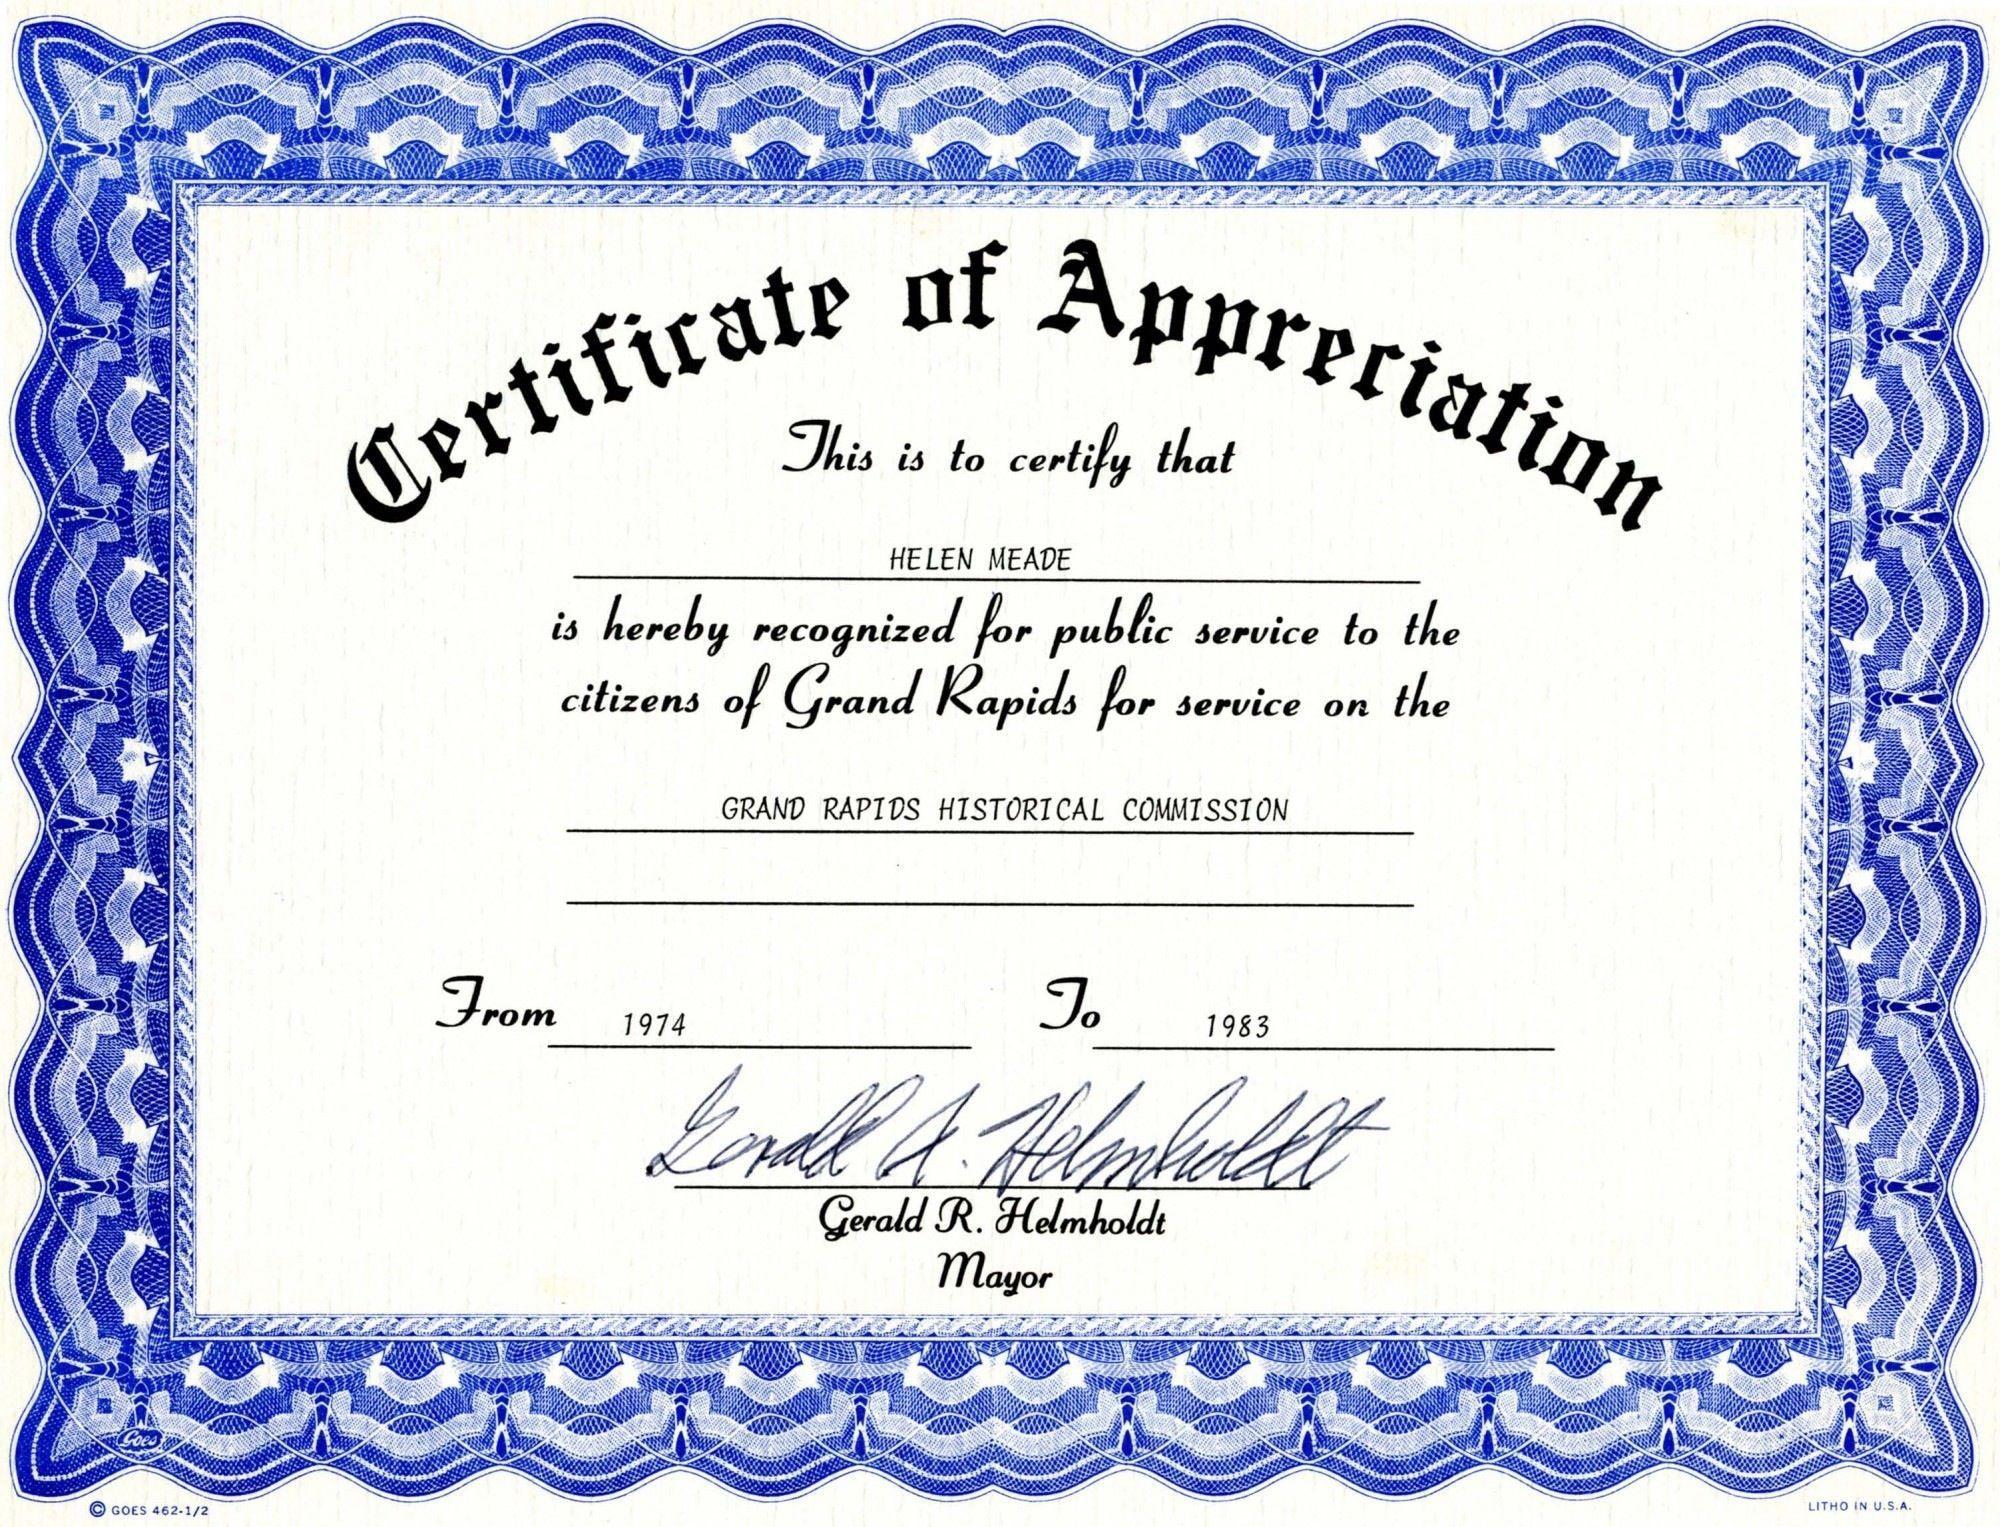 006 Shocking Free Printable Certificate Template Uk High Resolution Full